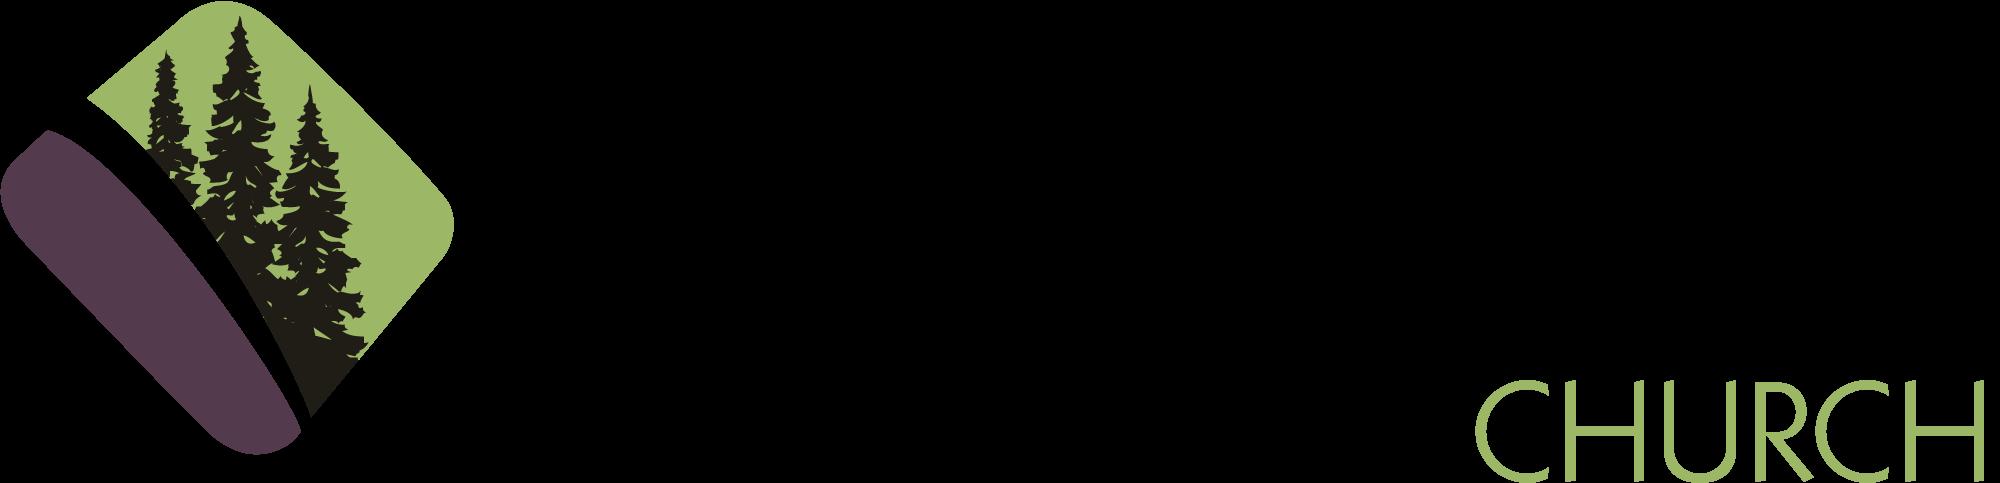 complete_logo_useonwhite.png